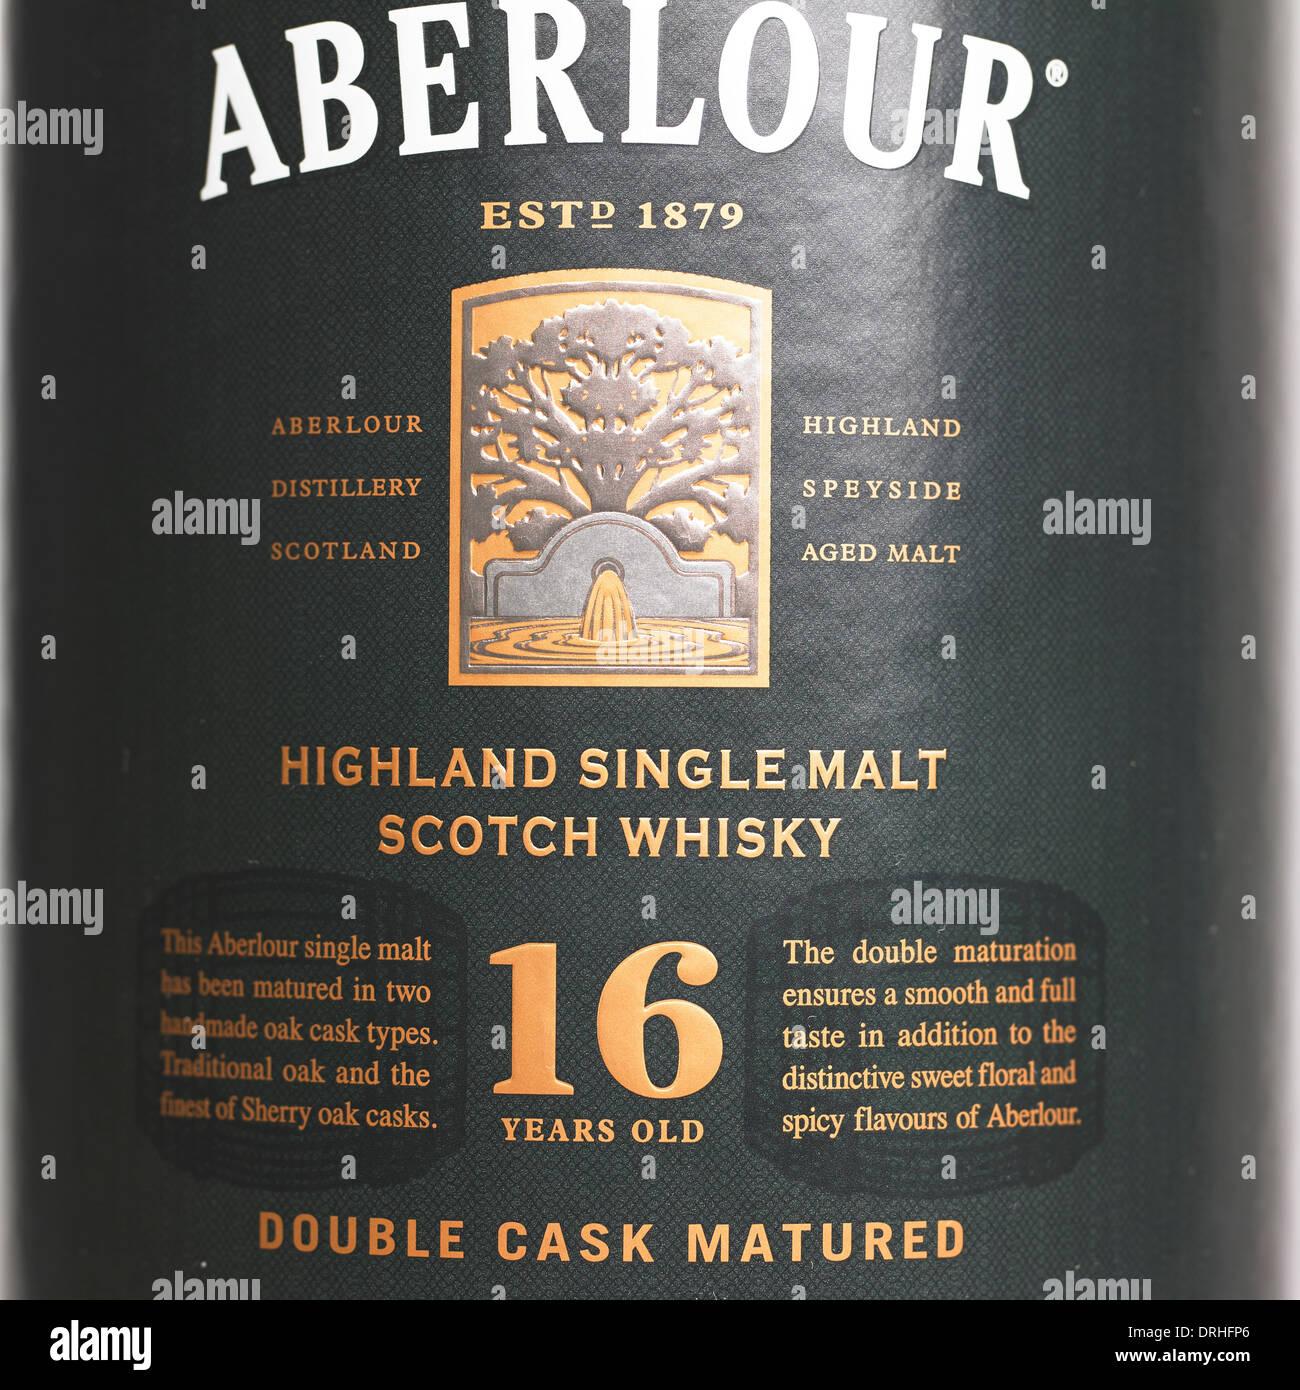 Aberlour 16 years old Scotch Whisky carton - Stock Image